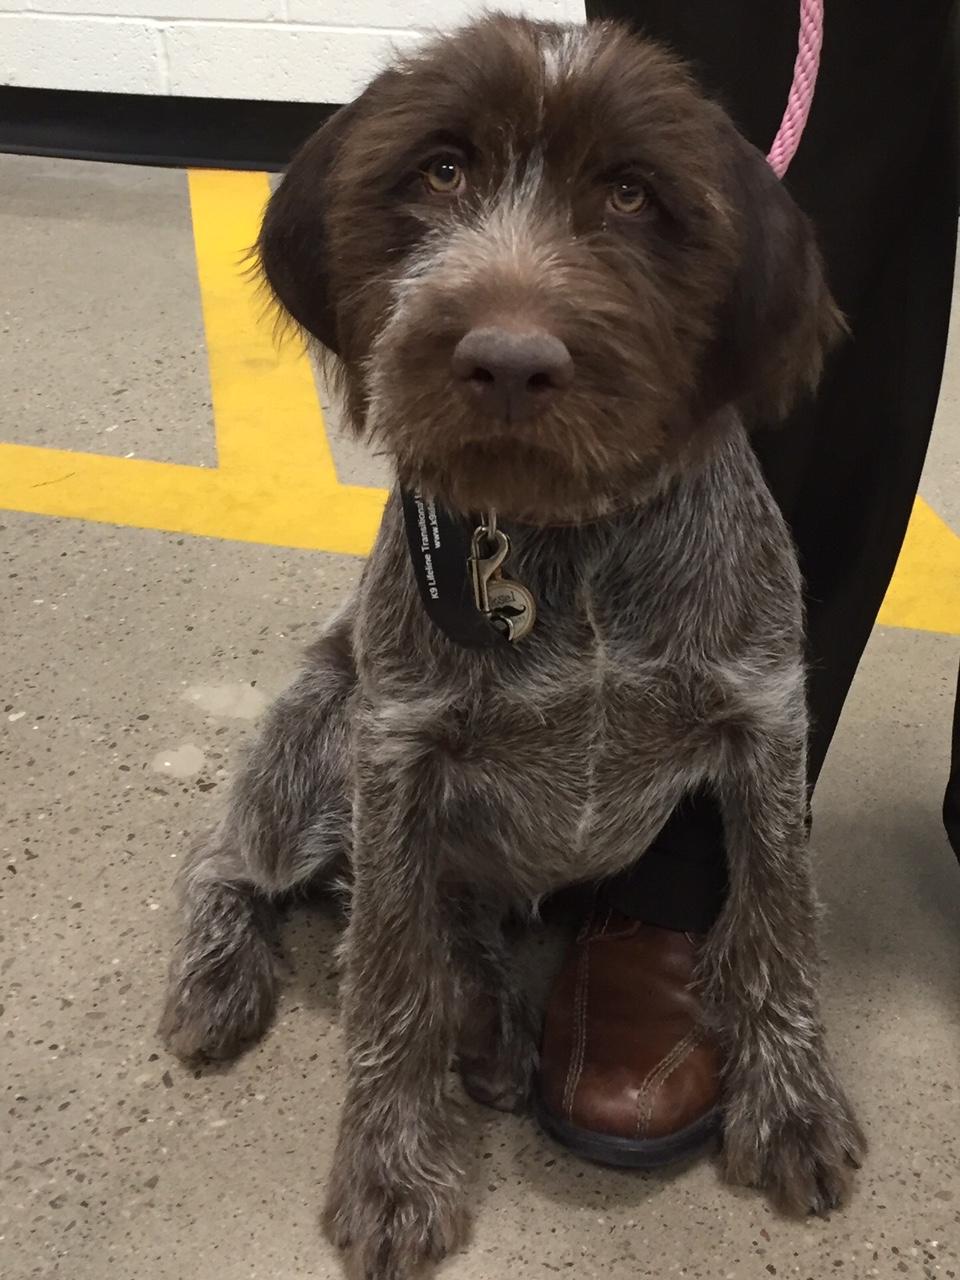 Oksel, AKC S.T.A.R. Puppy